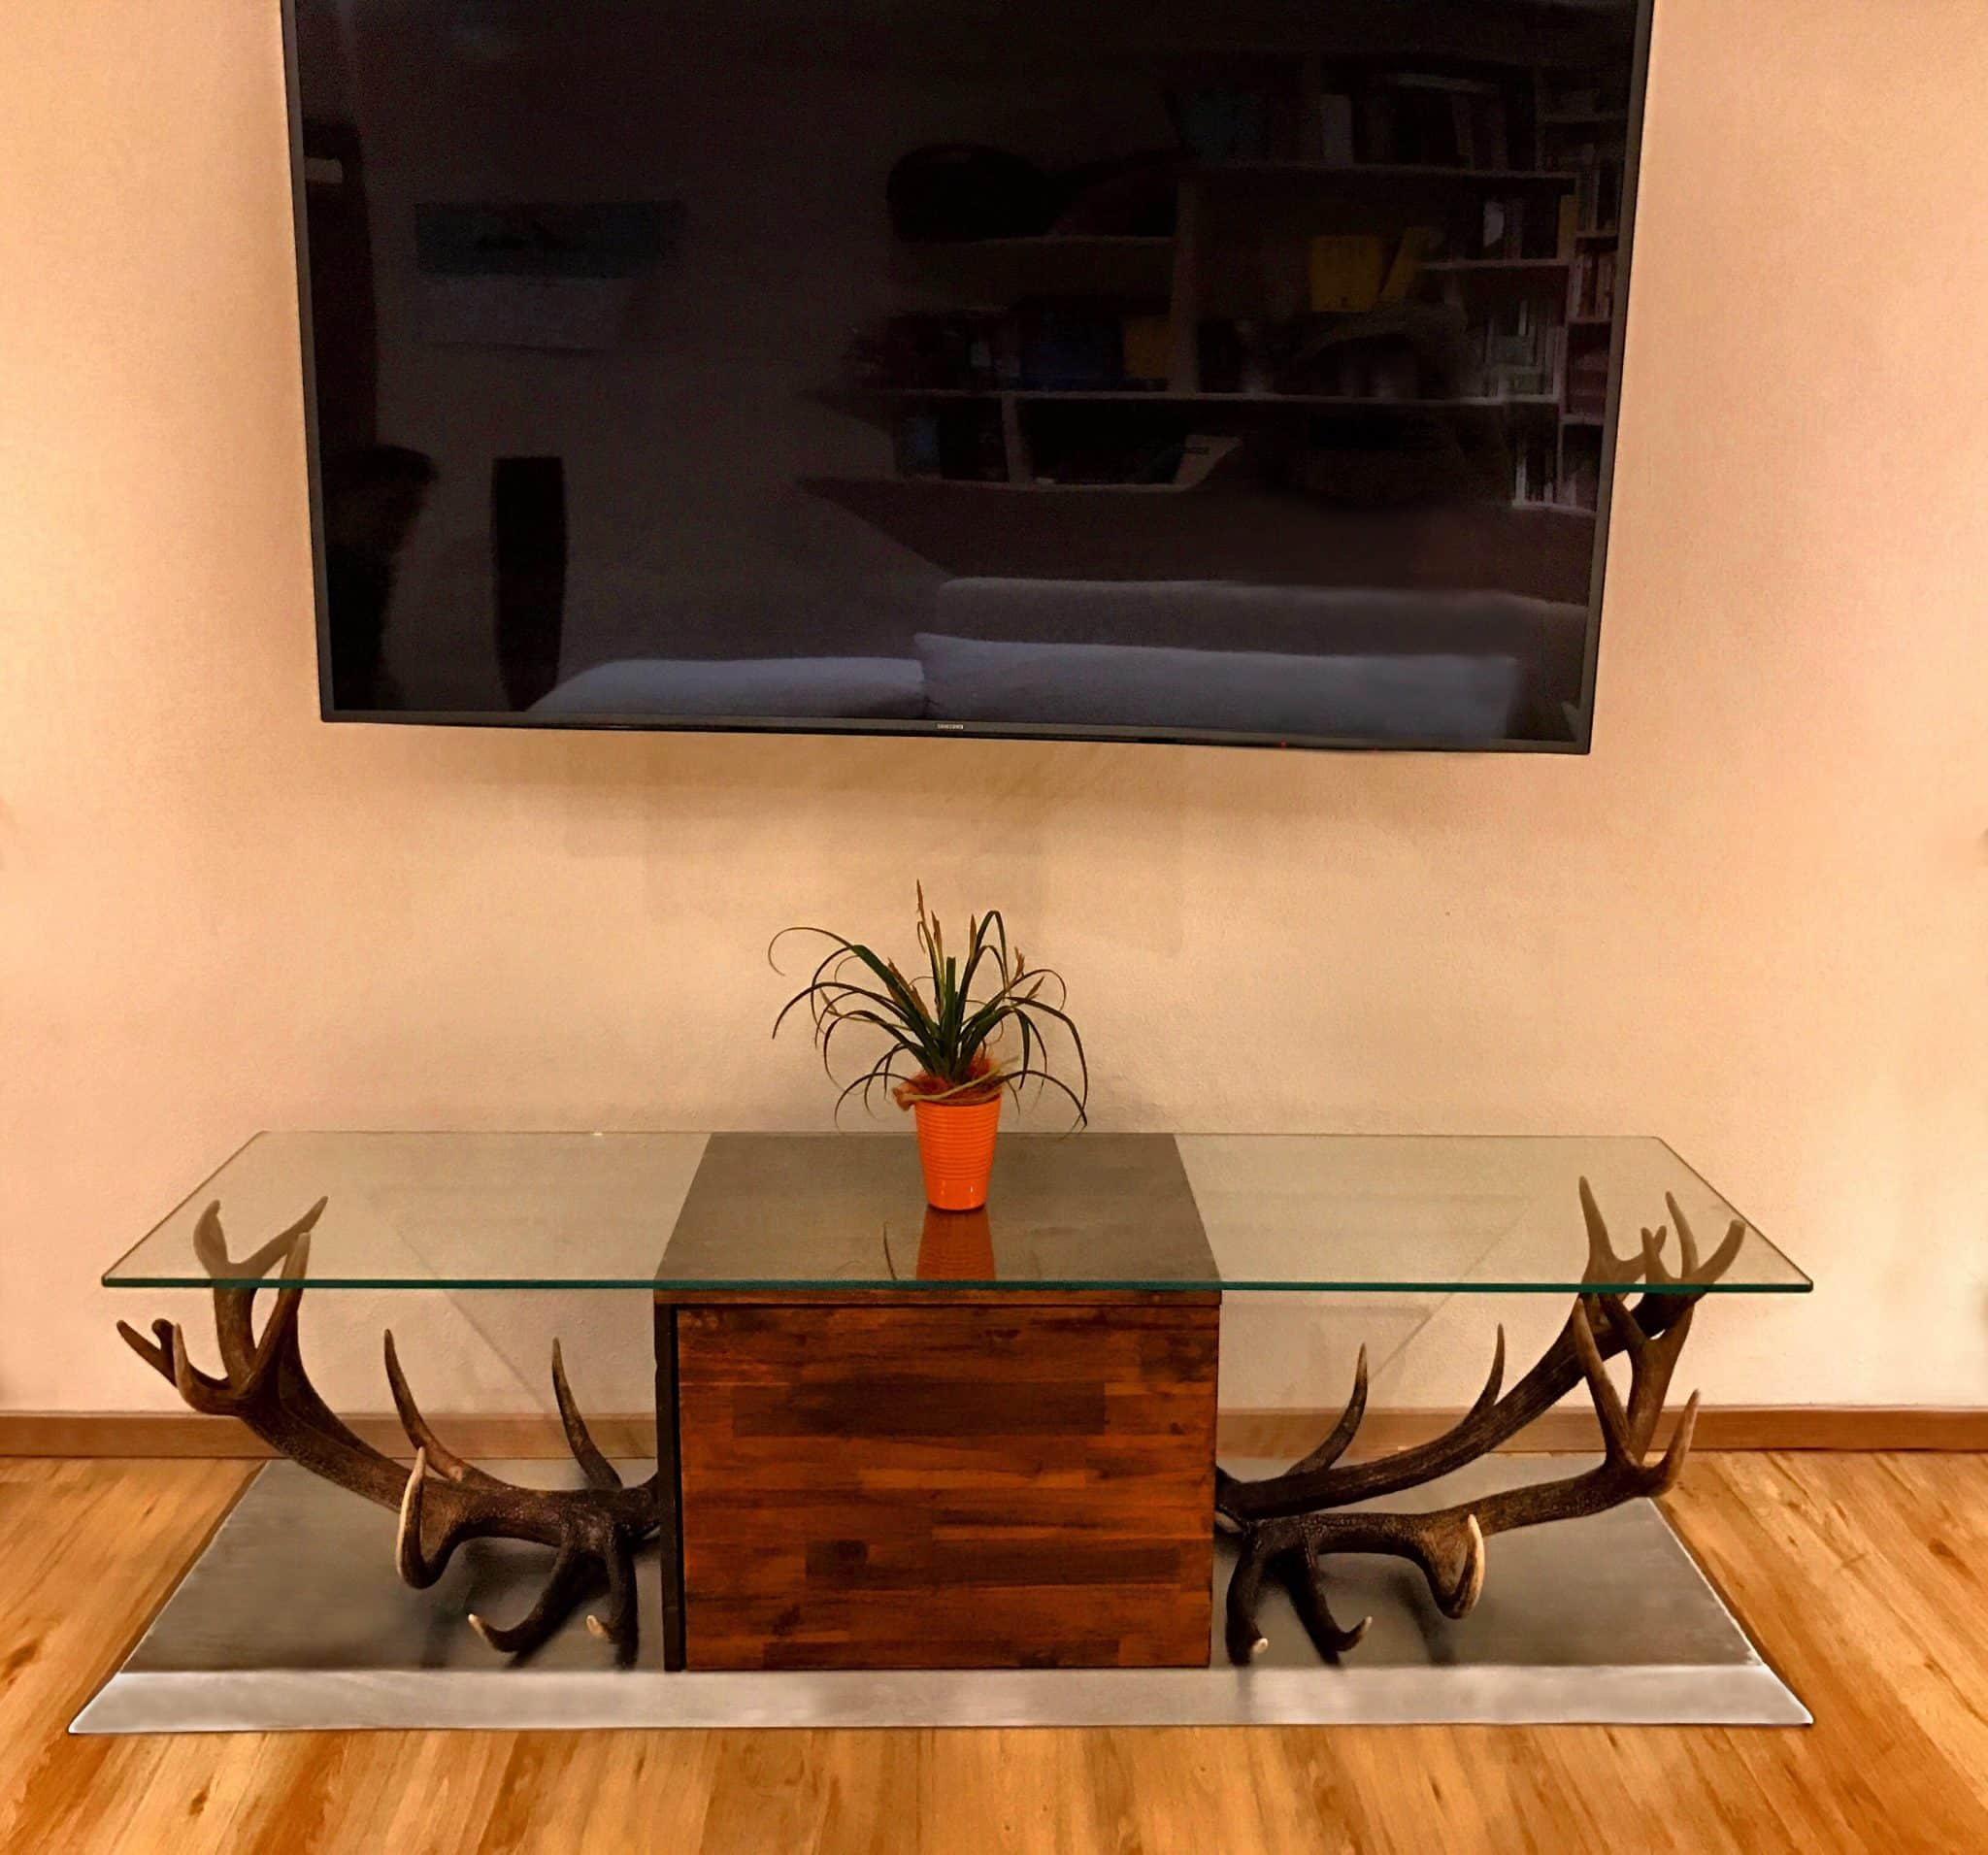 von oh my deer oh my deer hirschgeweih deko geweihlampen geweihm bel uvm. Black Bedroom Furniture Sets. Home Design Ideas